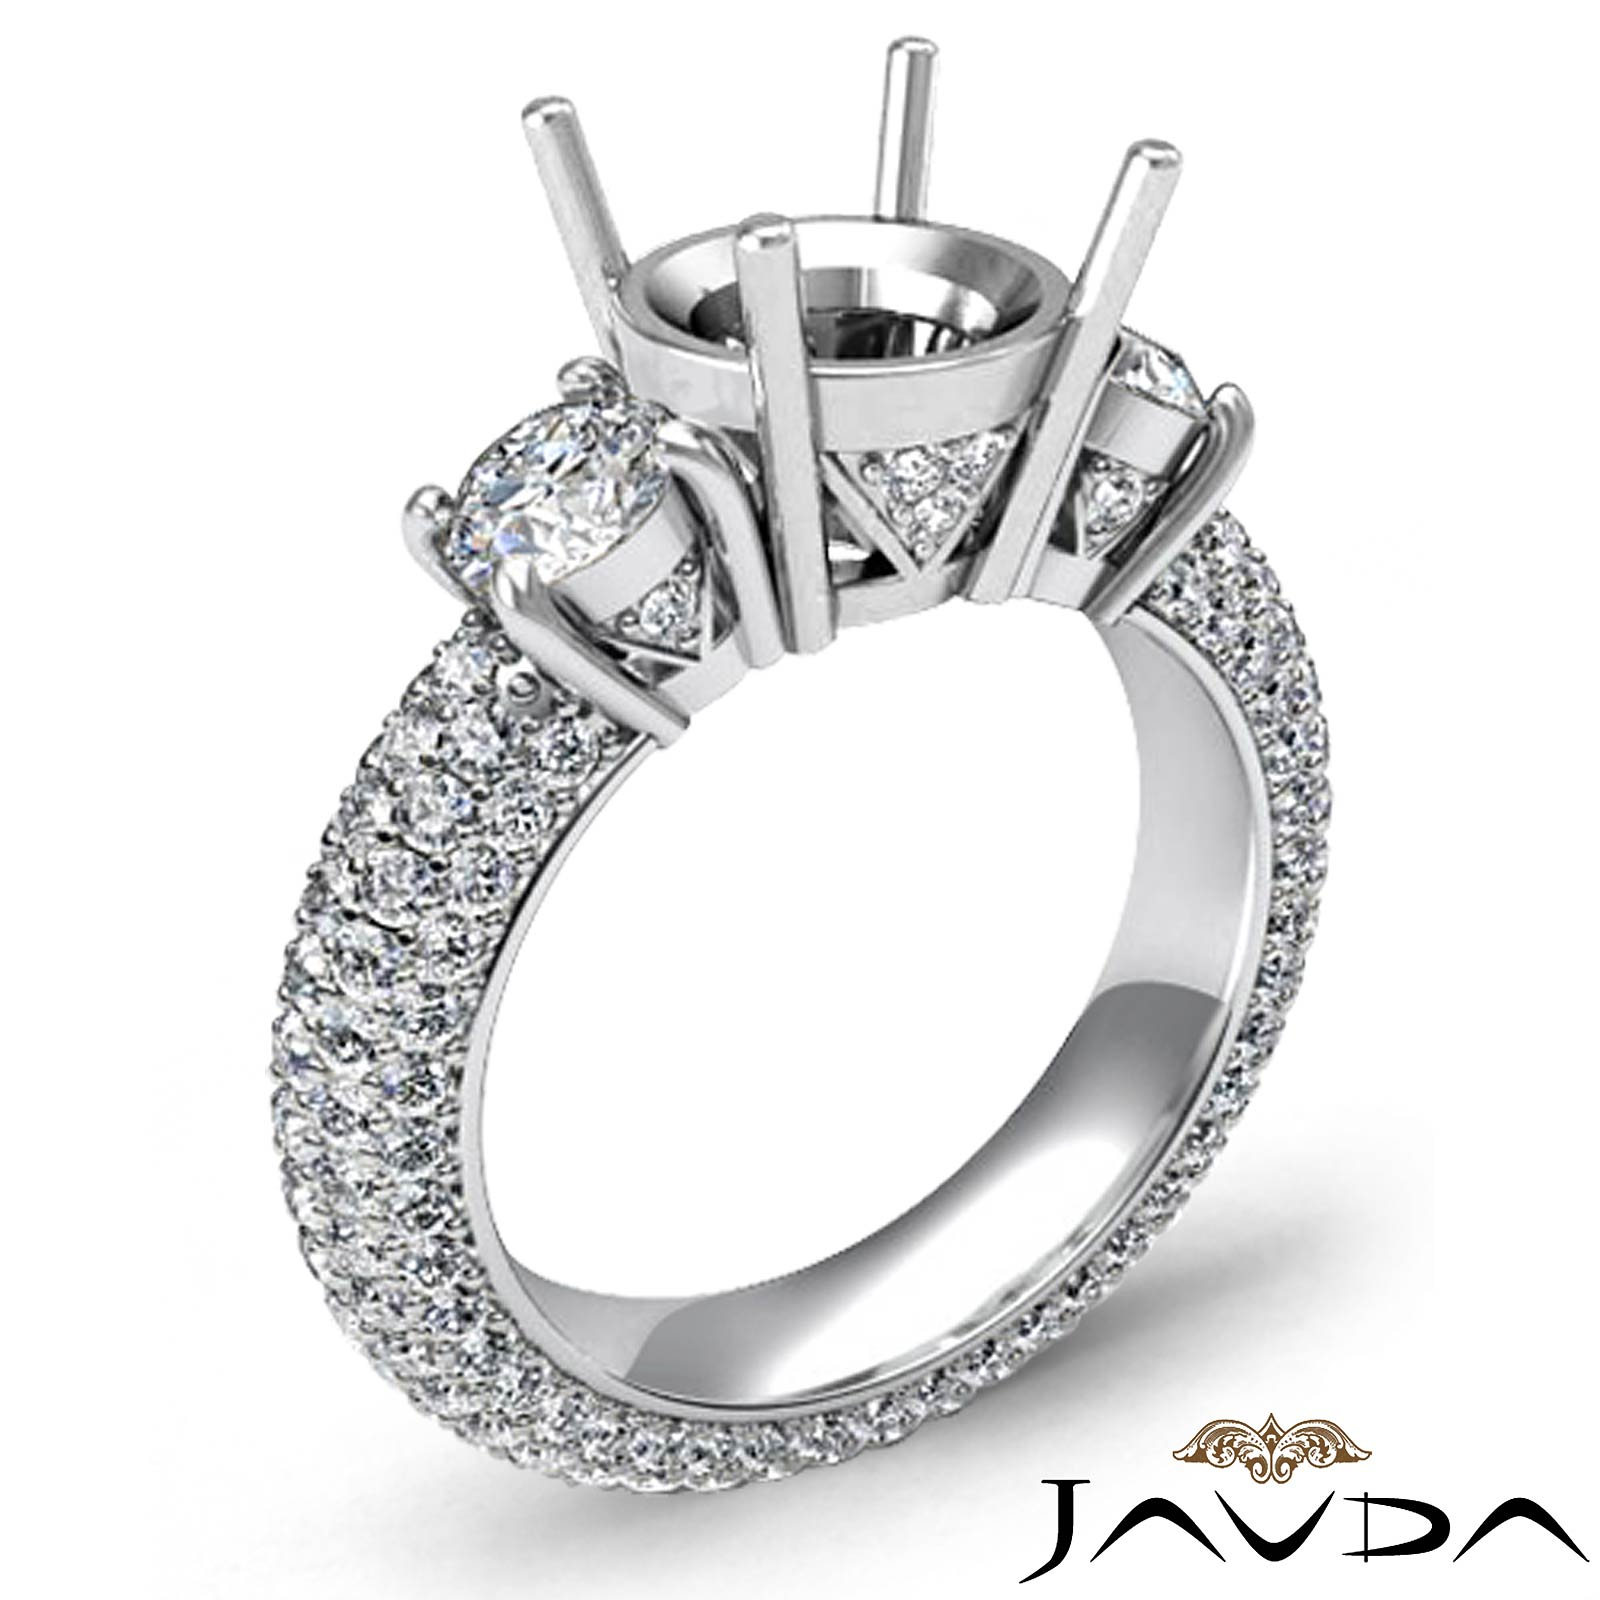 Three 3 Stone Round Diamond Engagement Ring Setting 14k W Gold Semi Mount 2 6Ct